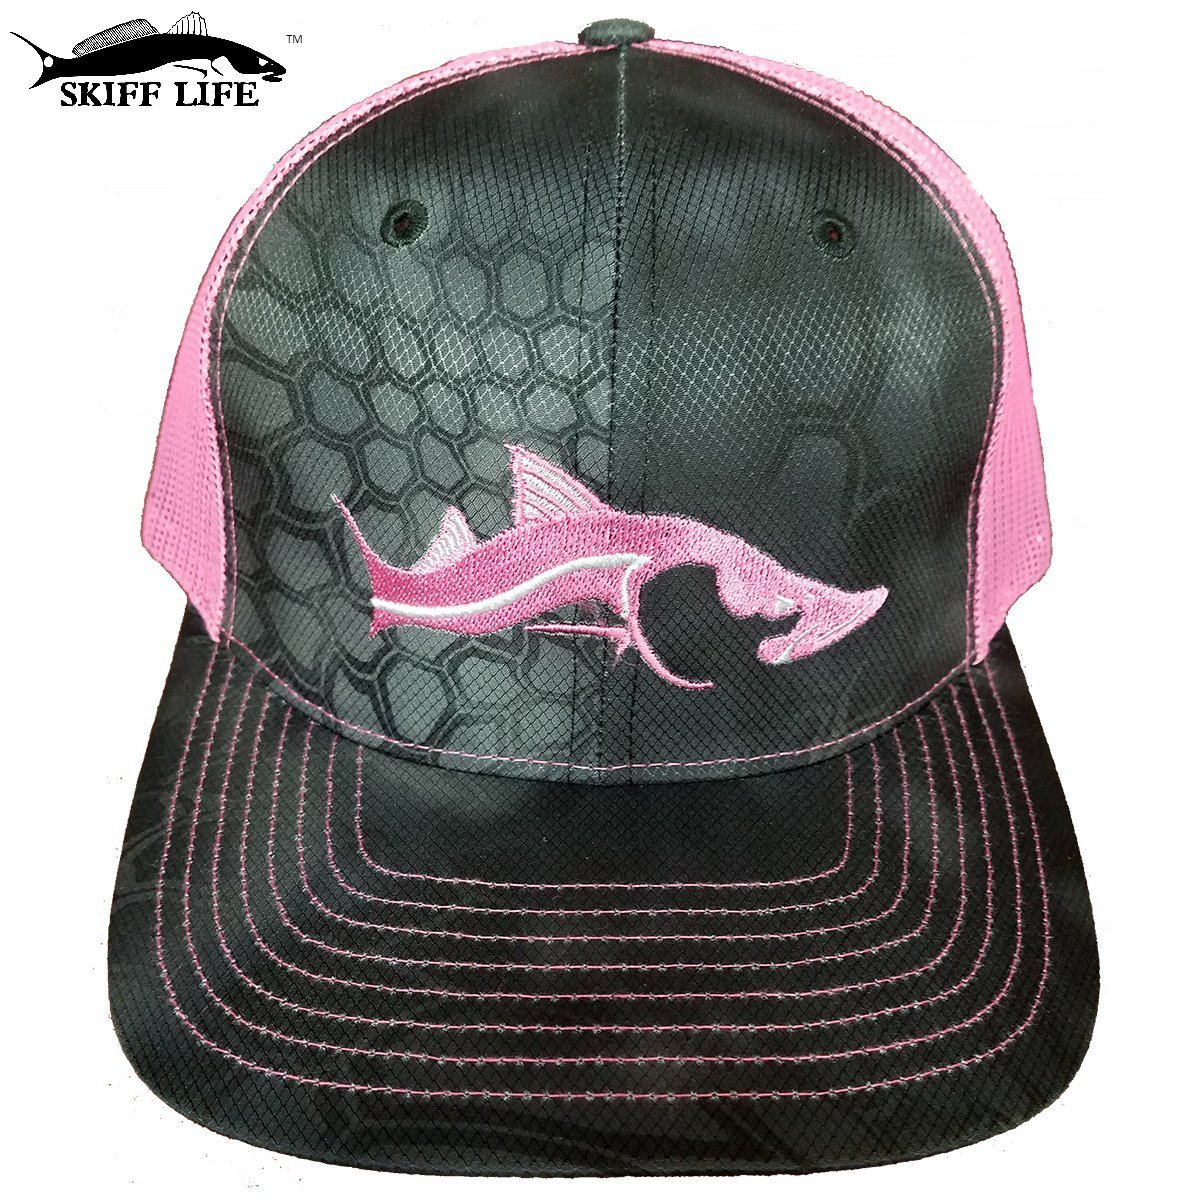 2dad9c65ba51a Get Quotations · Skiff Life HOT PINK Snook Hat! Kryptek Typhon Camo Fishing  Hat Neon Pink Meshback Pink